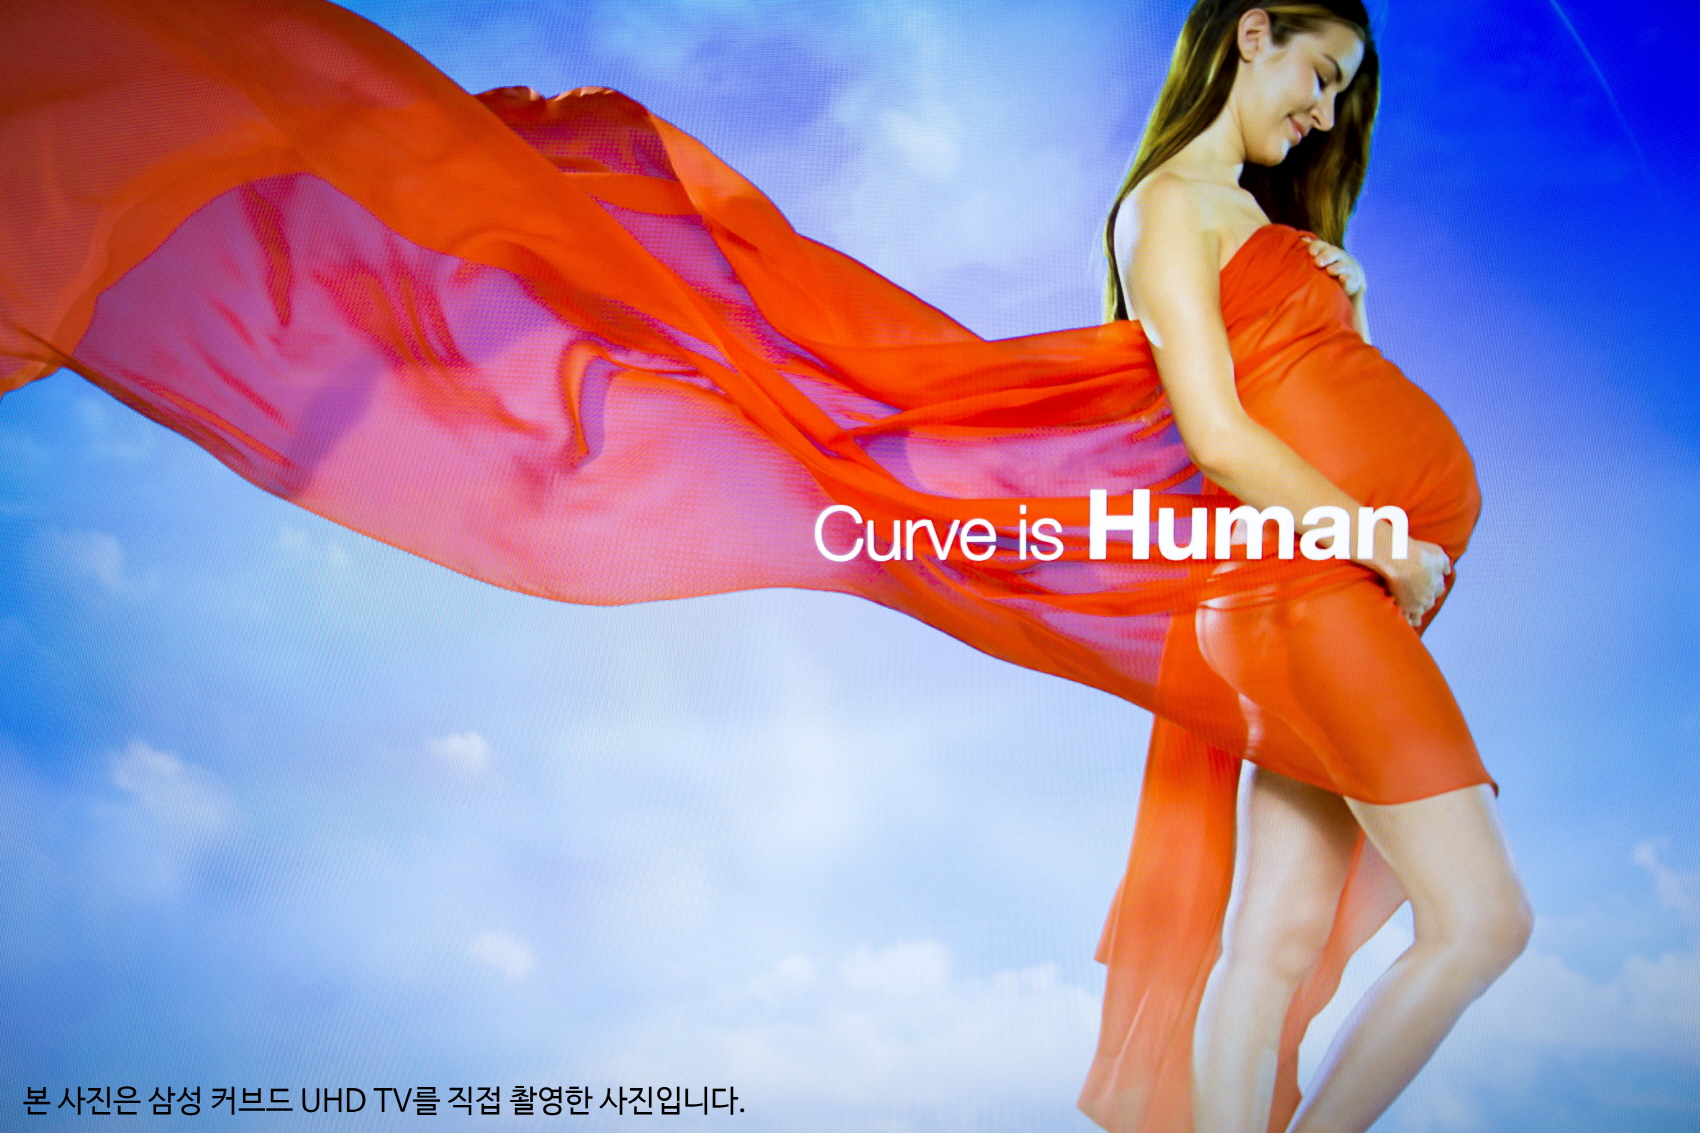 Curve is Human. 본 사진은 삼성 커브드 UHD TV를 직접 촬영한 사진입니다.